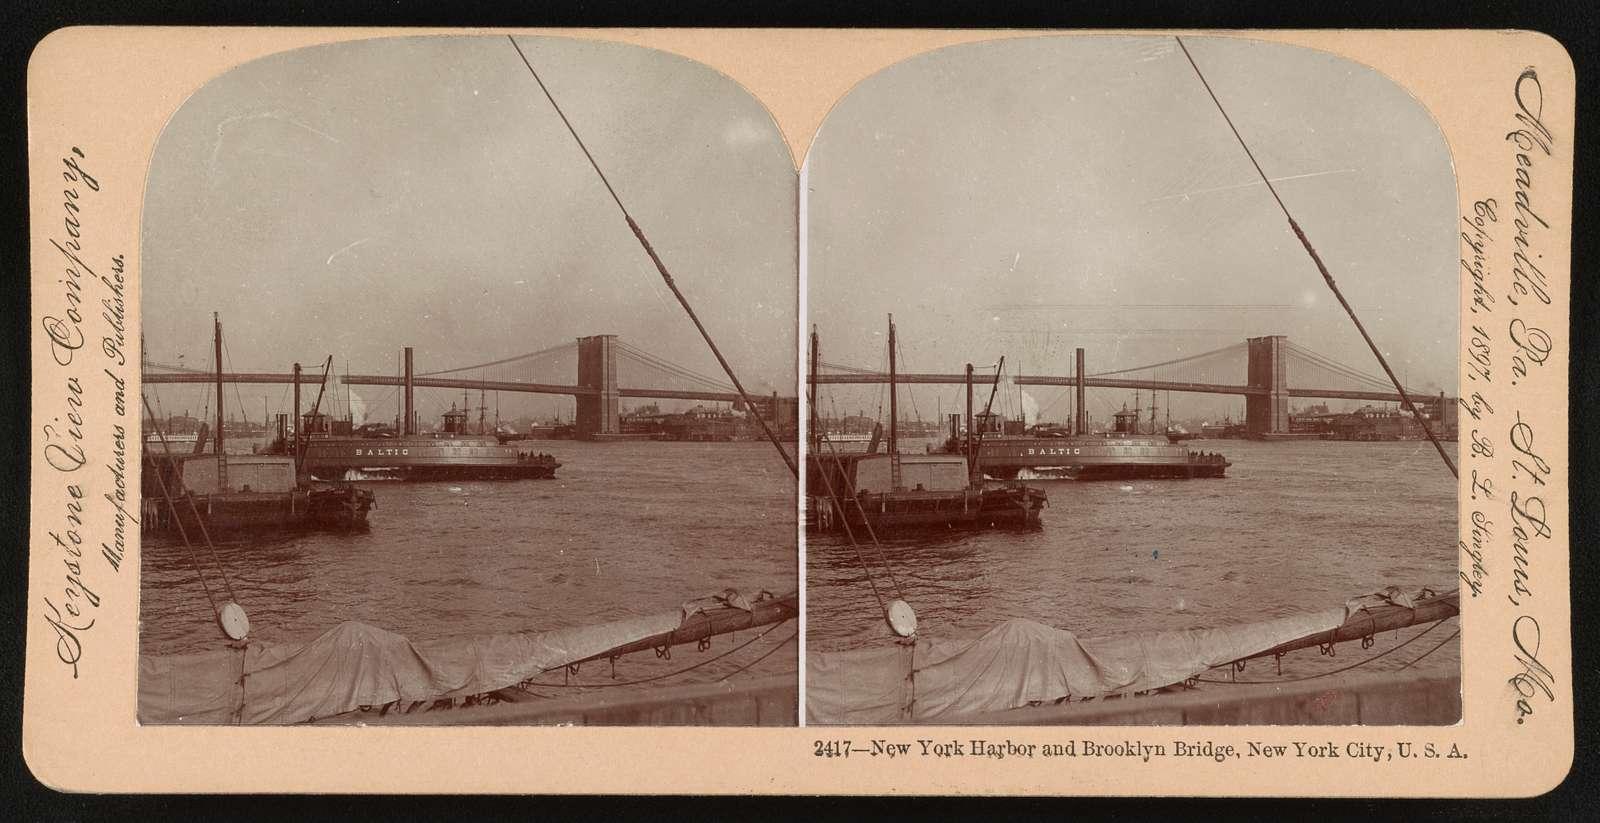 New York Harbor and Brooklyn Bridge, New York City, U. S. A